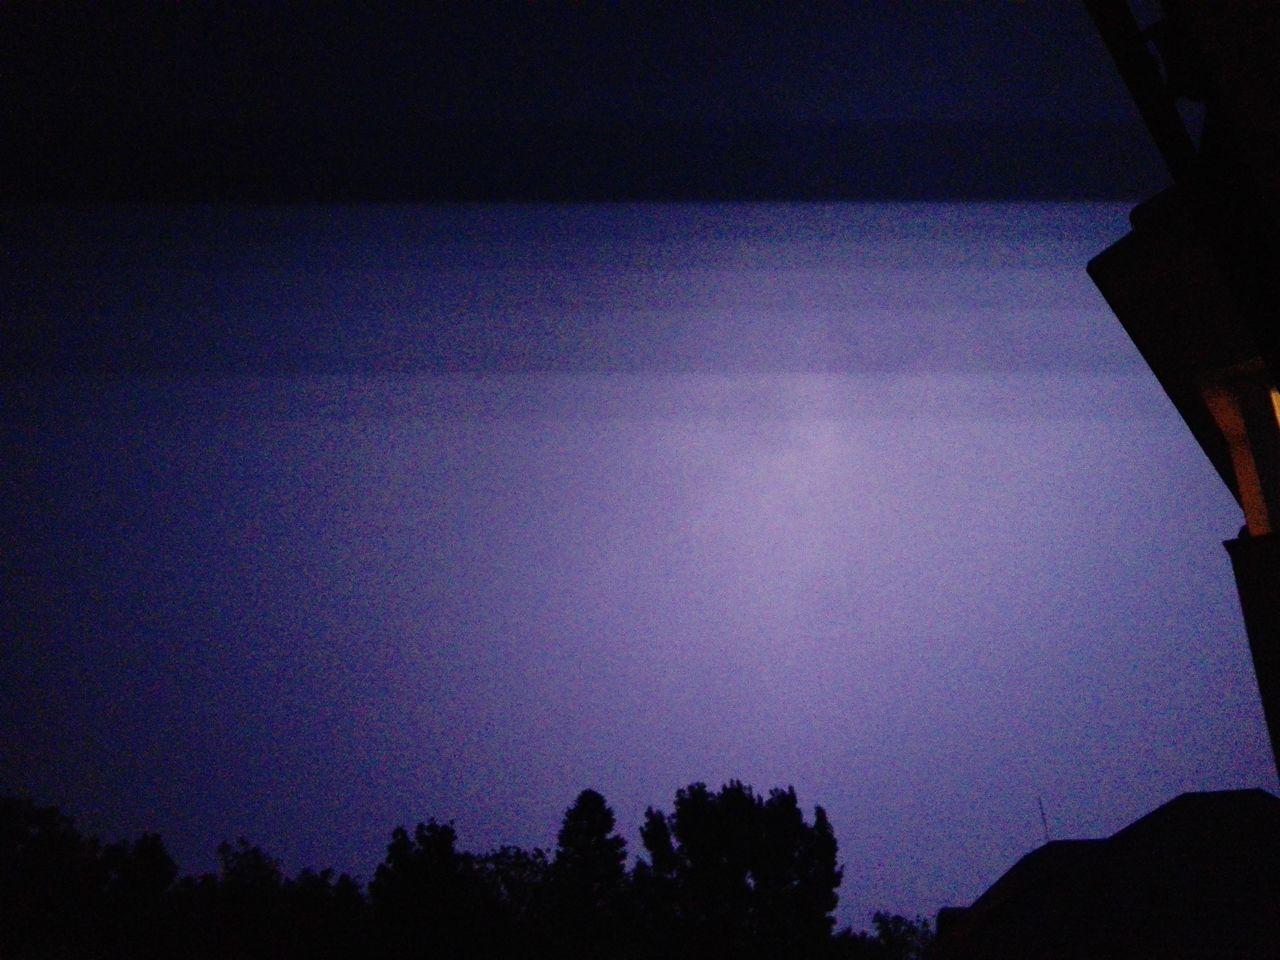 Night Nature Sky Storm Light Lightning Bolt Power In Nature Itsnightnow Hungary